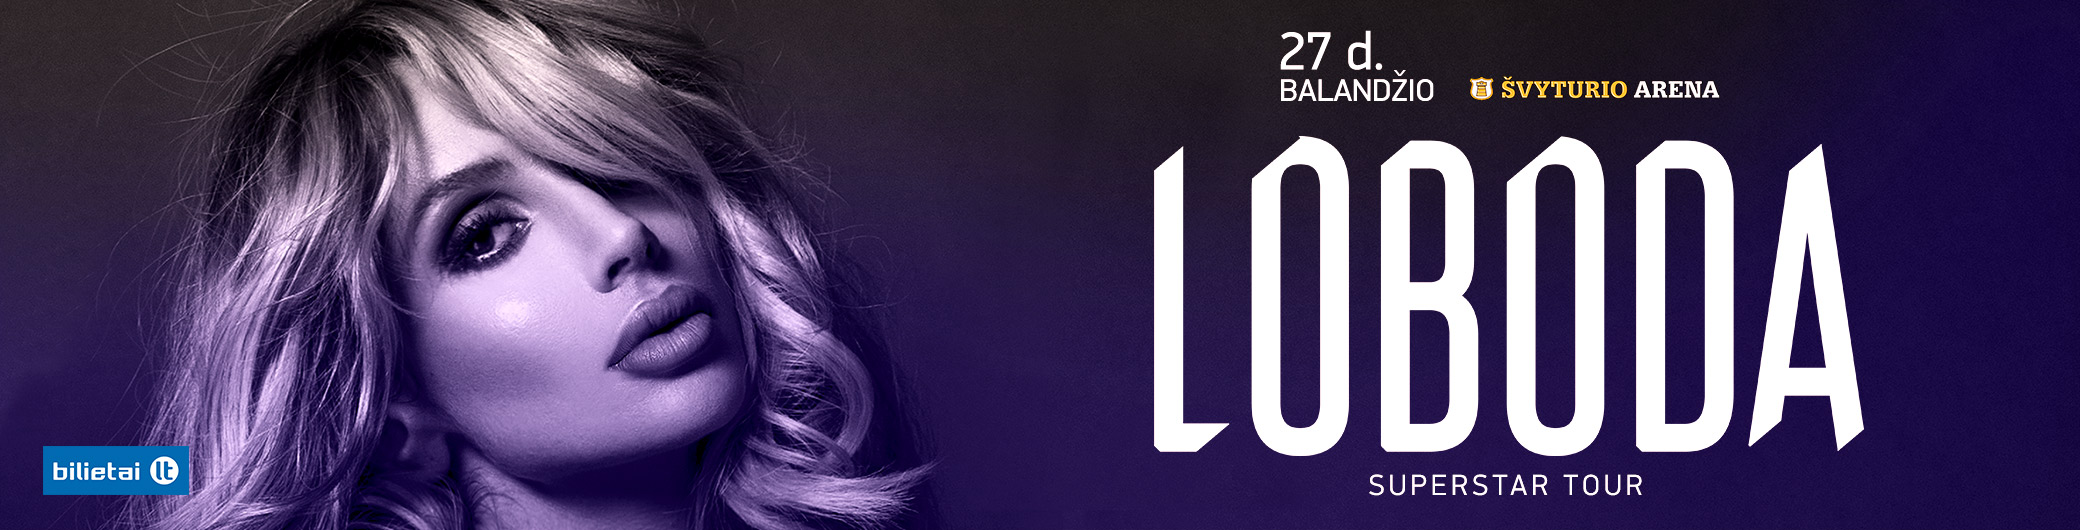 http://laisvadiena.lt/upload/391_-LOBODA-Superstar-Tour-2019.jpg